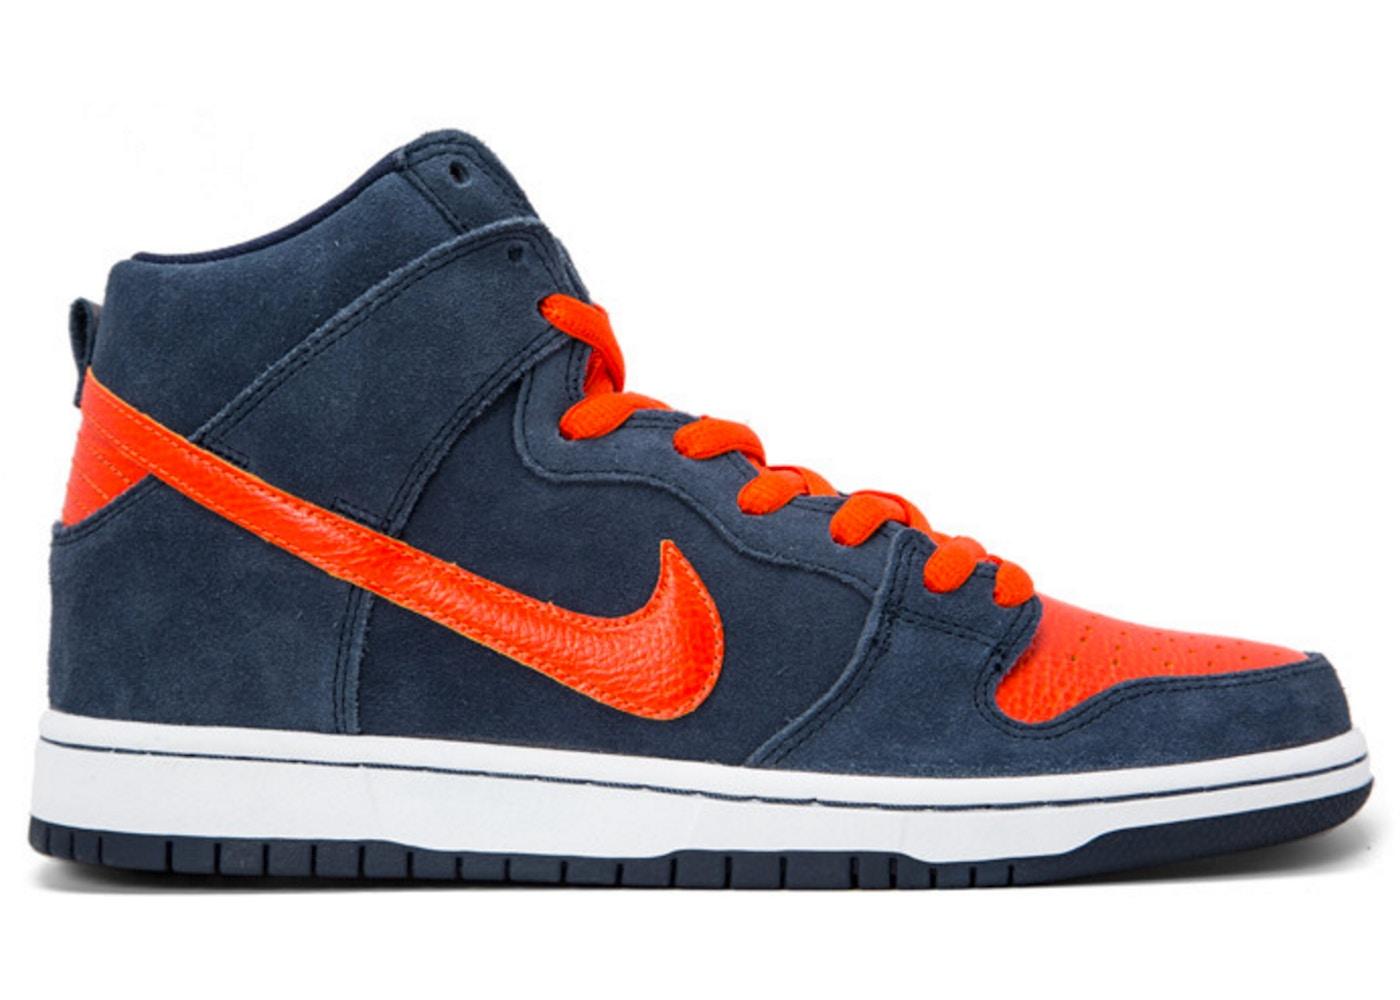 reputable site 5372c 0a74c Nike Dunk SB High Syracuse - 305050-481